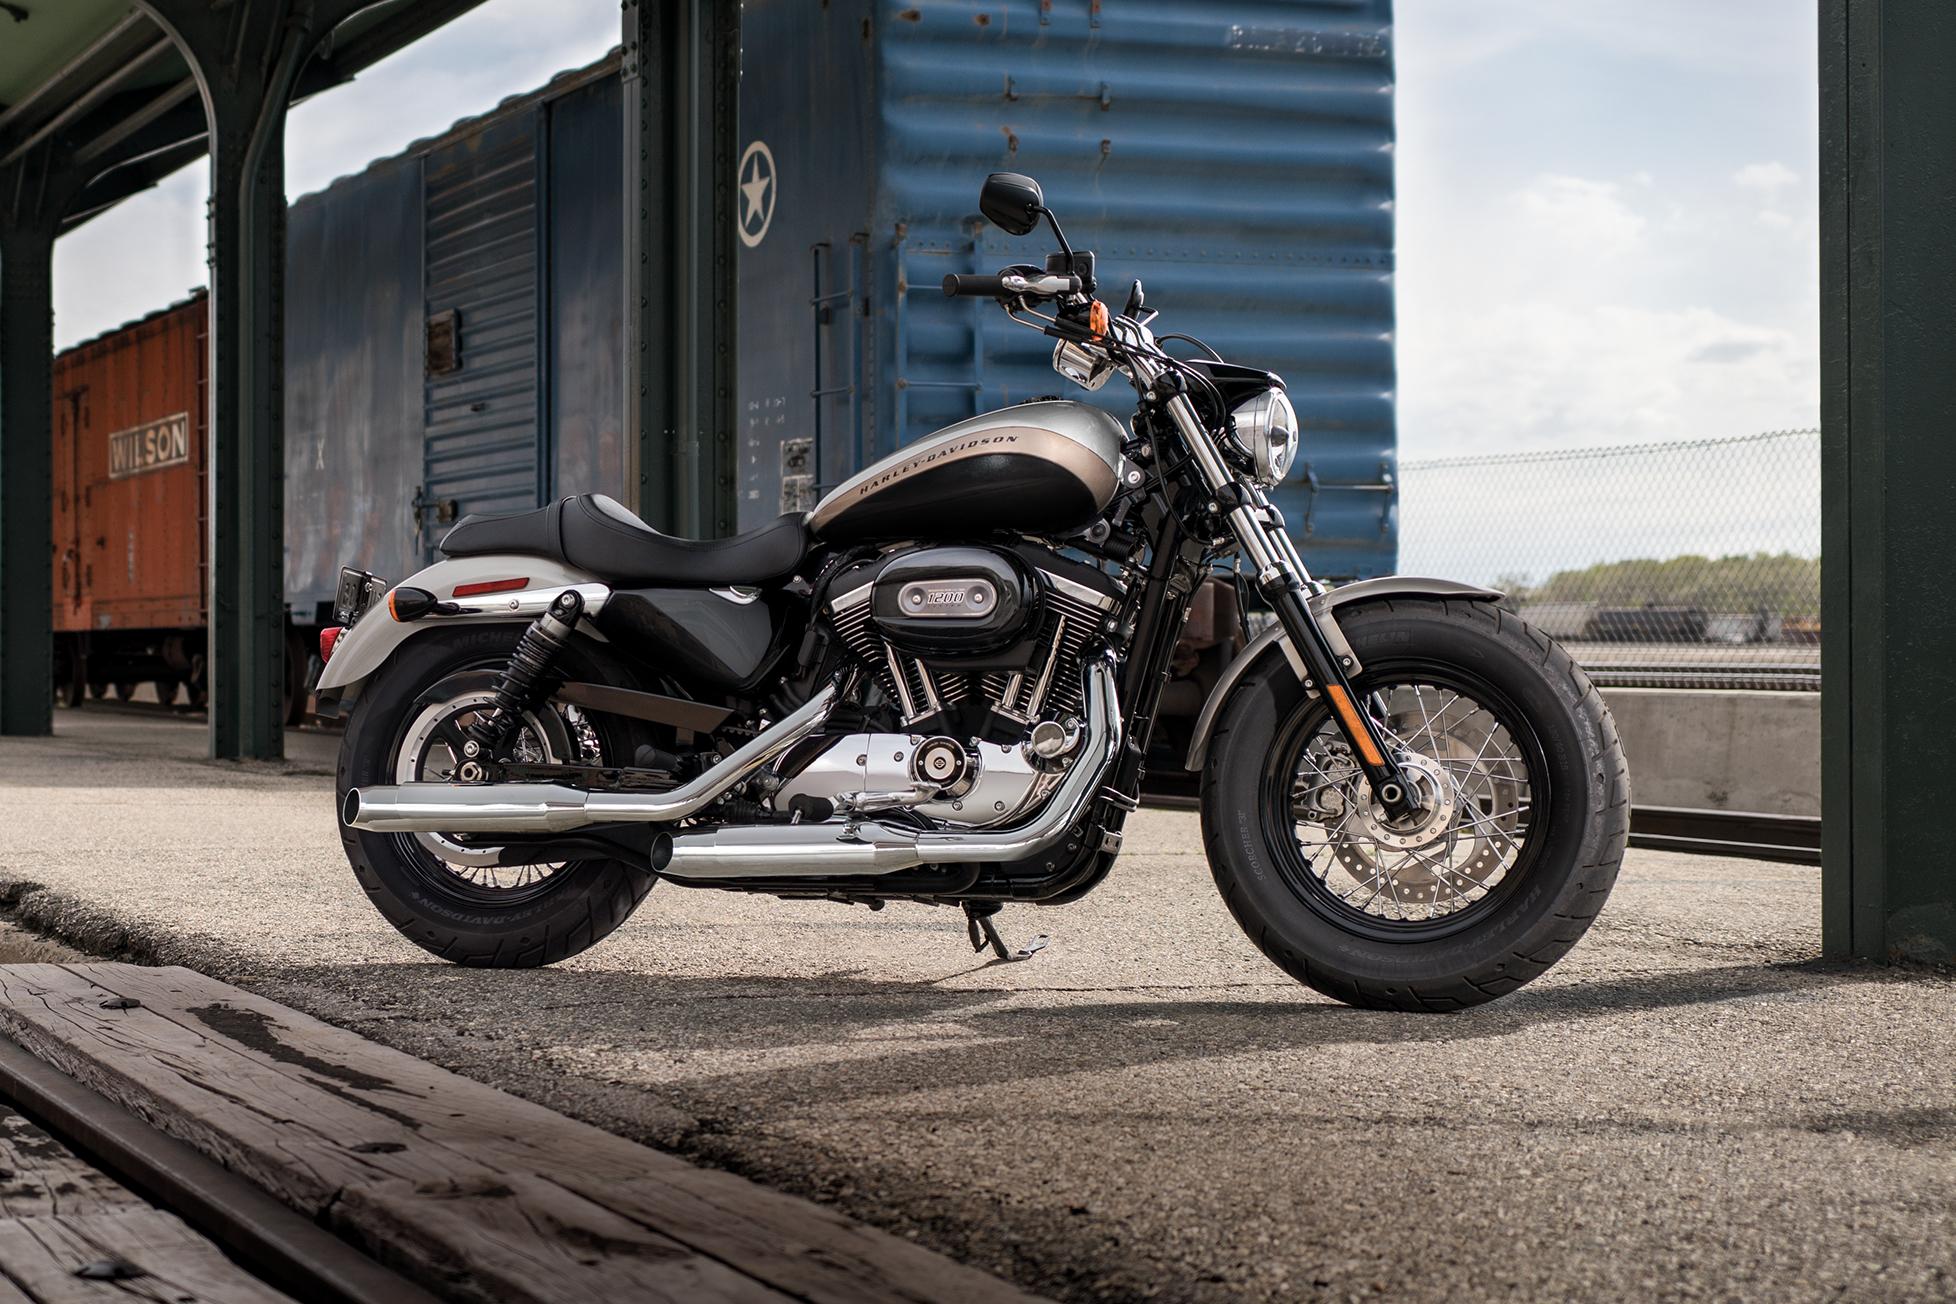 2018 sportster 1200 custom harley davidson usa rh harley davidson com Harley 1200R 2007 Harley 1200 Low Sportster